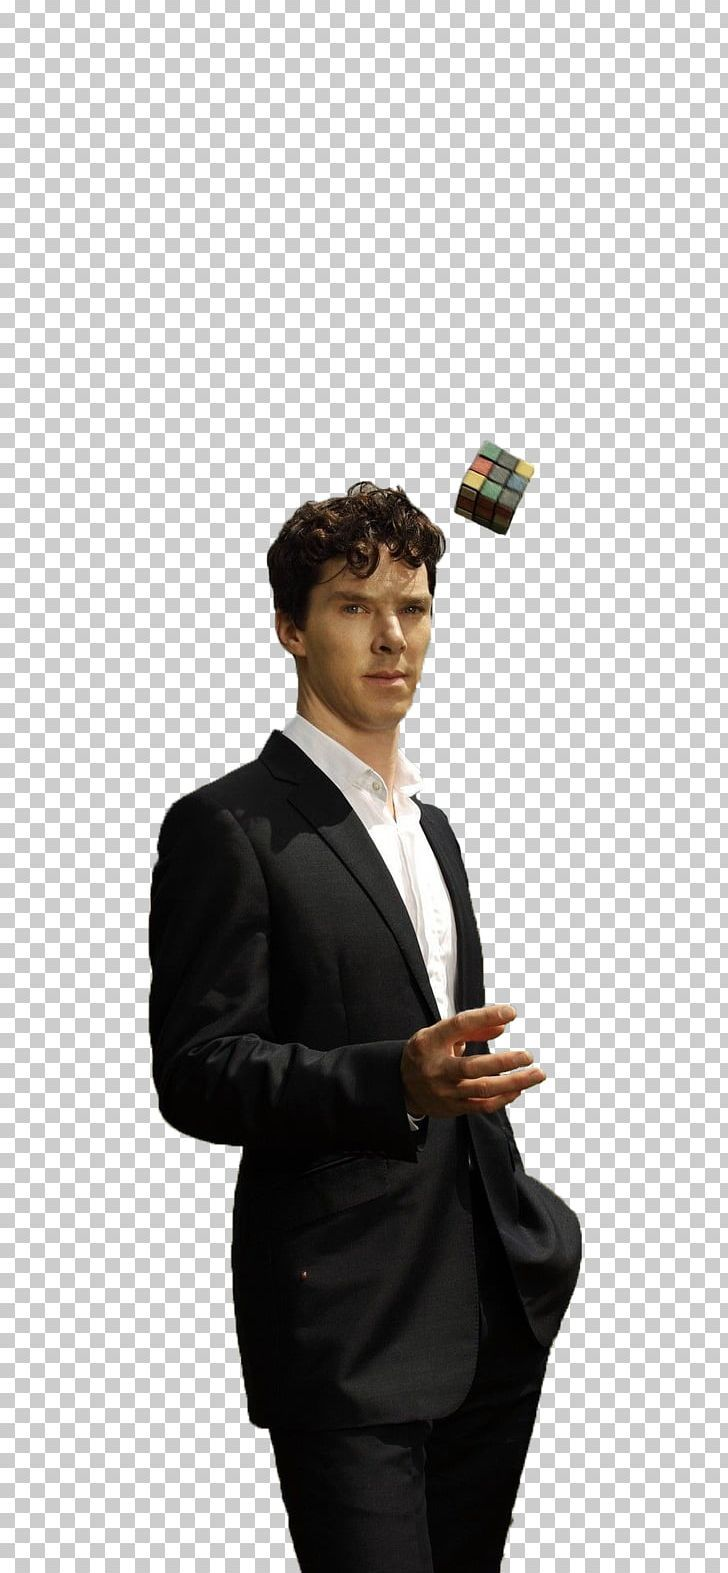 Benedict Cumberbatch Sherlock Holmes Smaug Png Benedict Cumberbatch Businesspe Sherlock Wallpaper Sherlock Holmes Funny Sherlock Holmes Benedict Cumberbatch